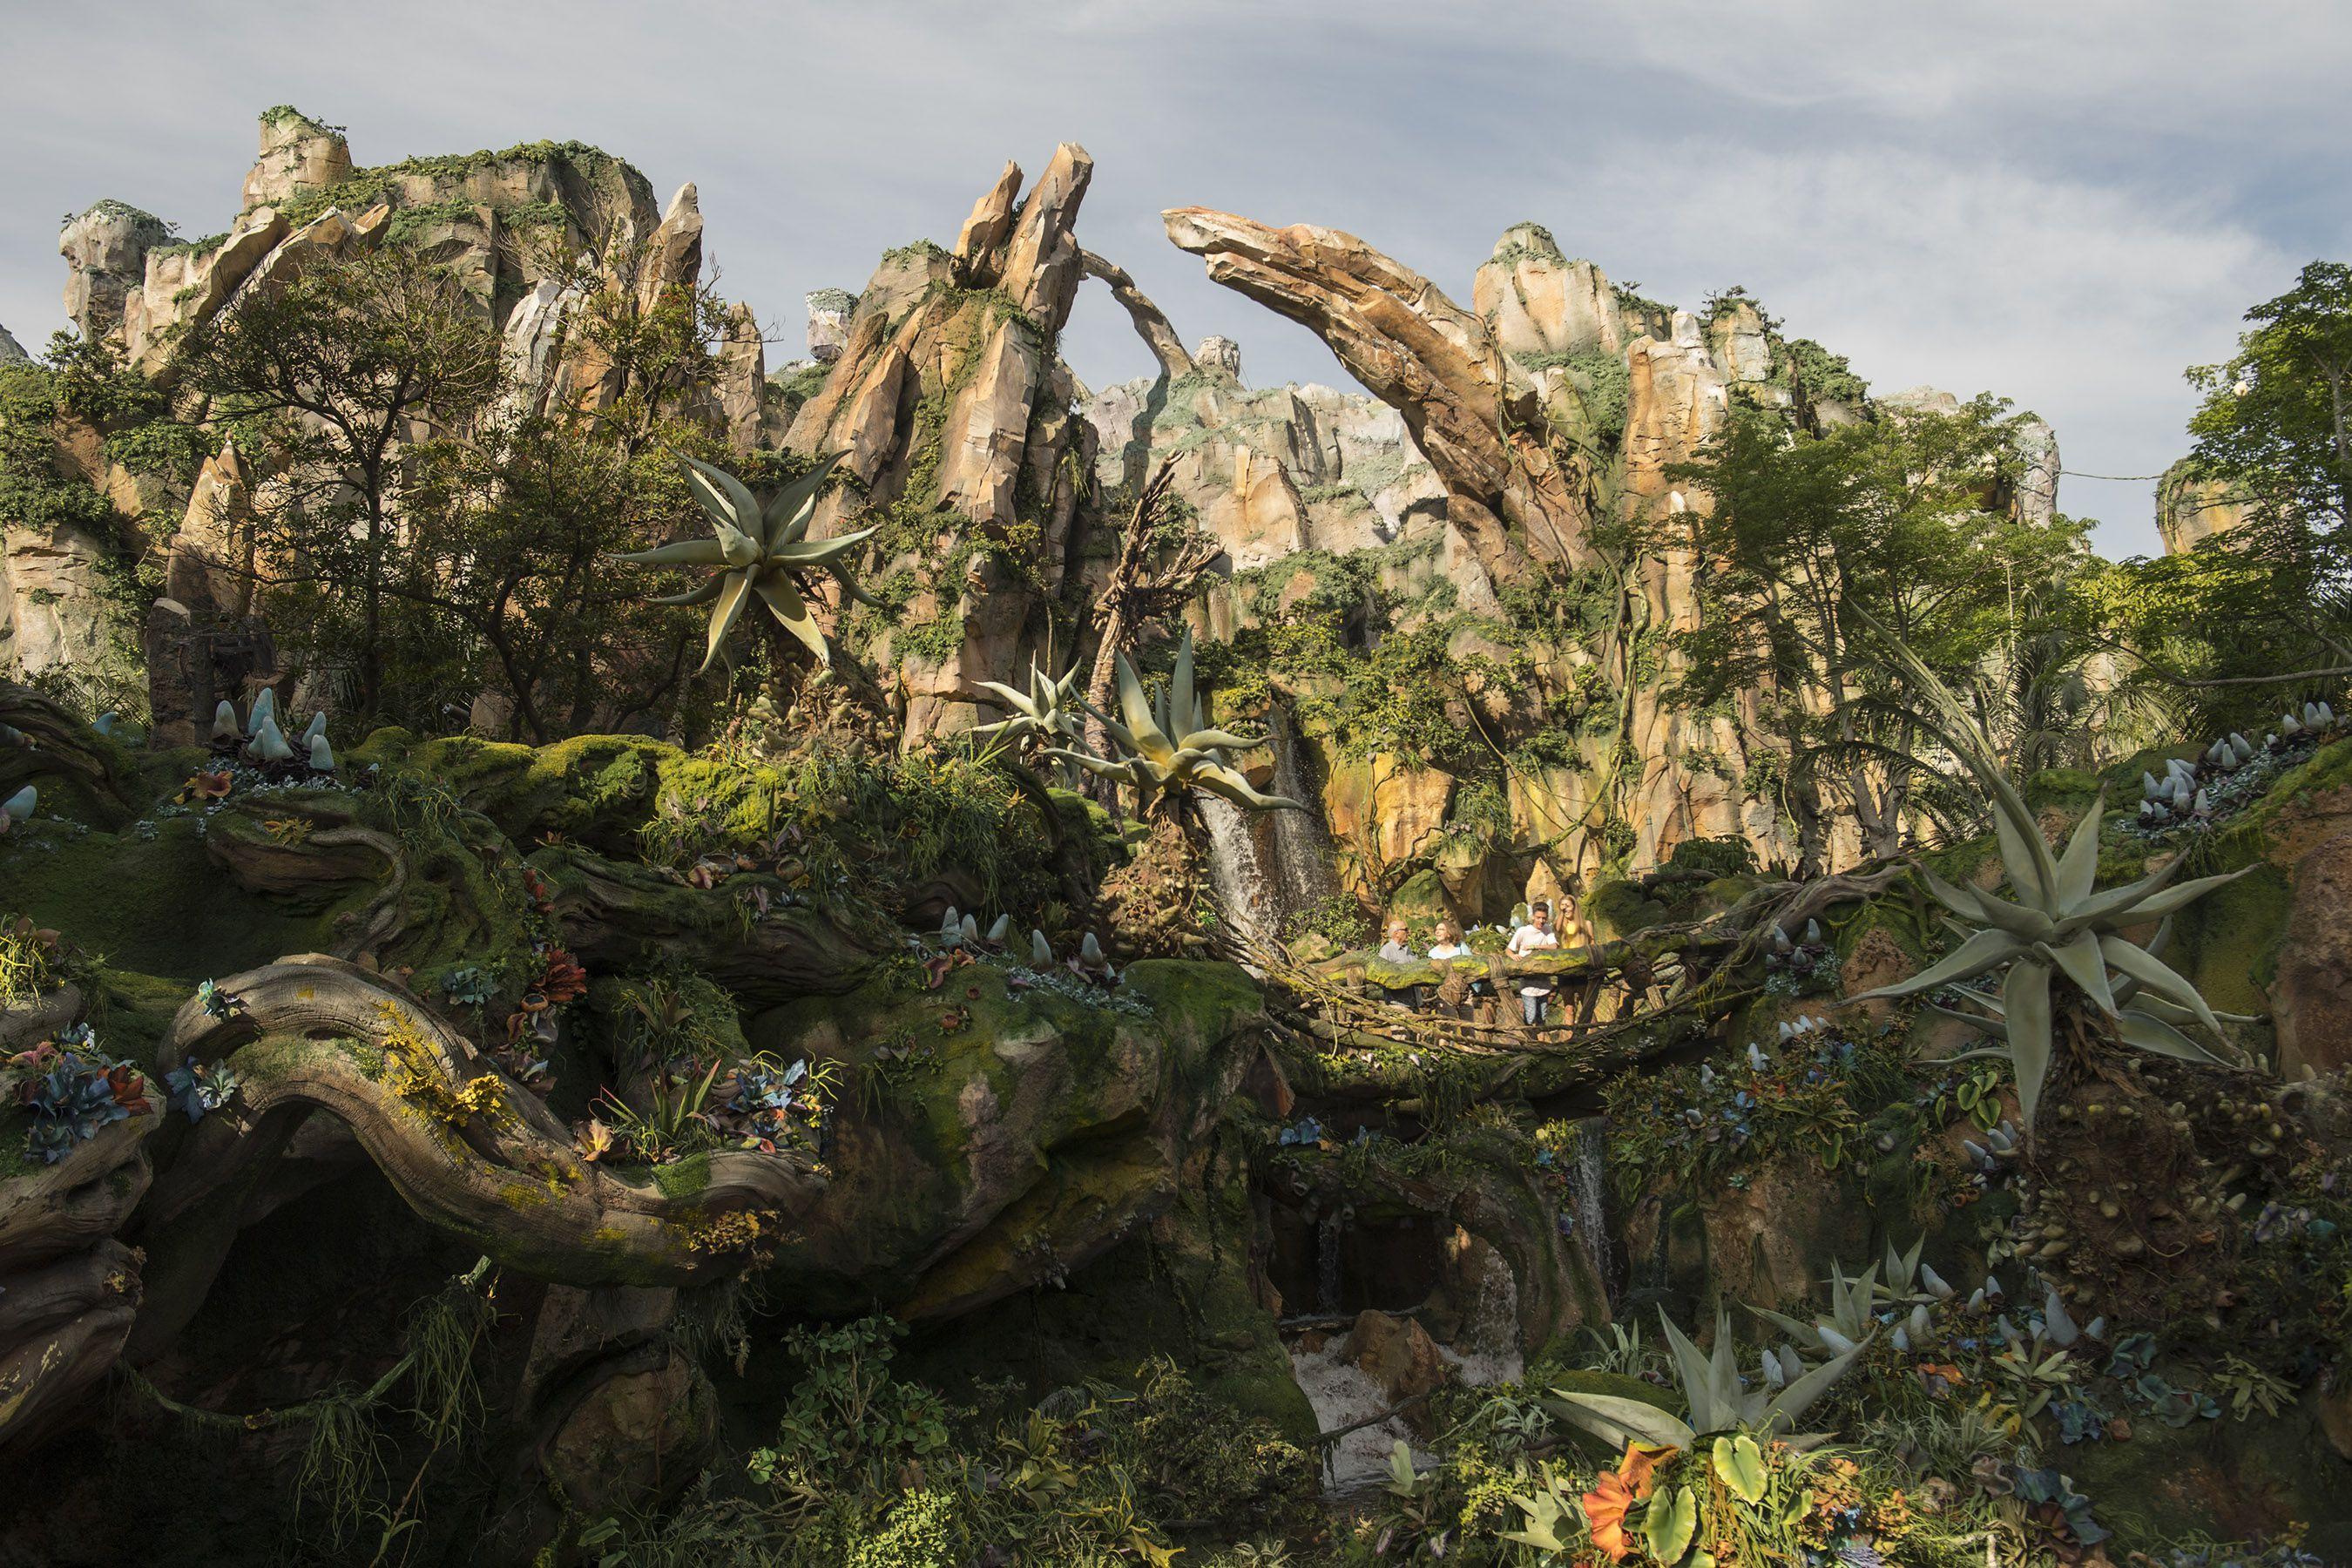 Pandora, the World of Avatar in Animal Kingdom